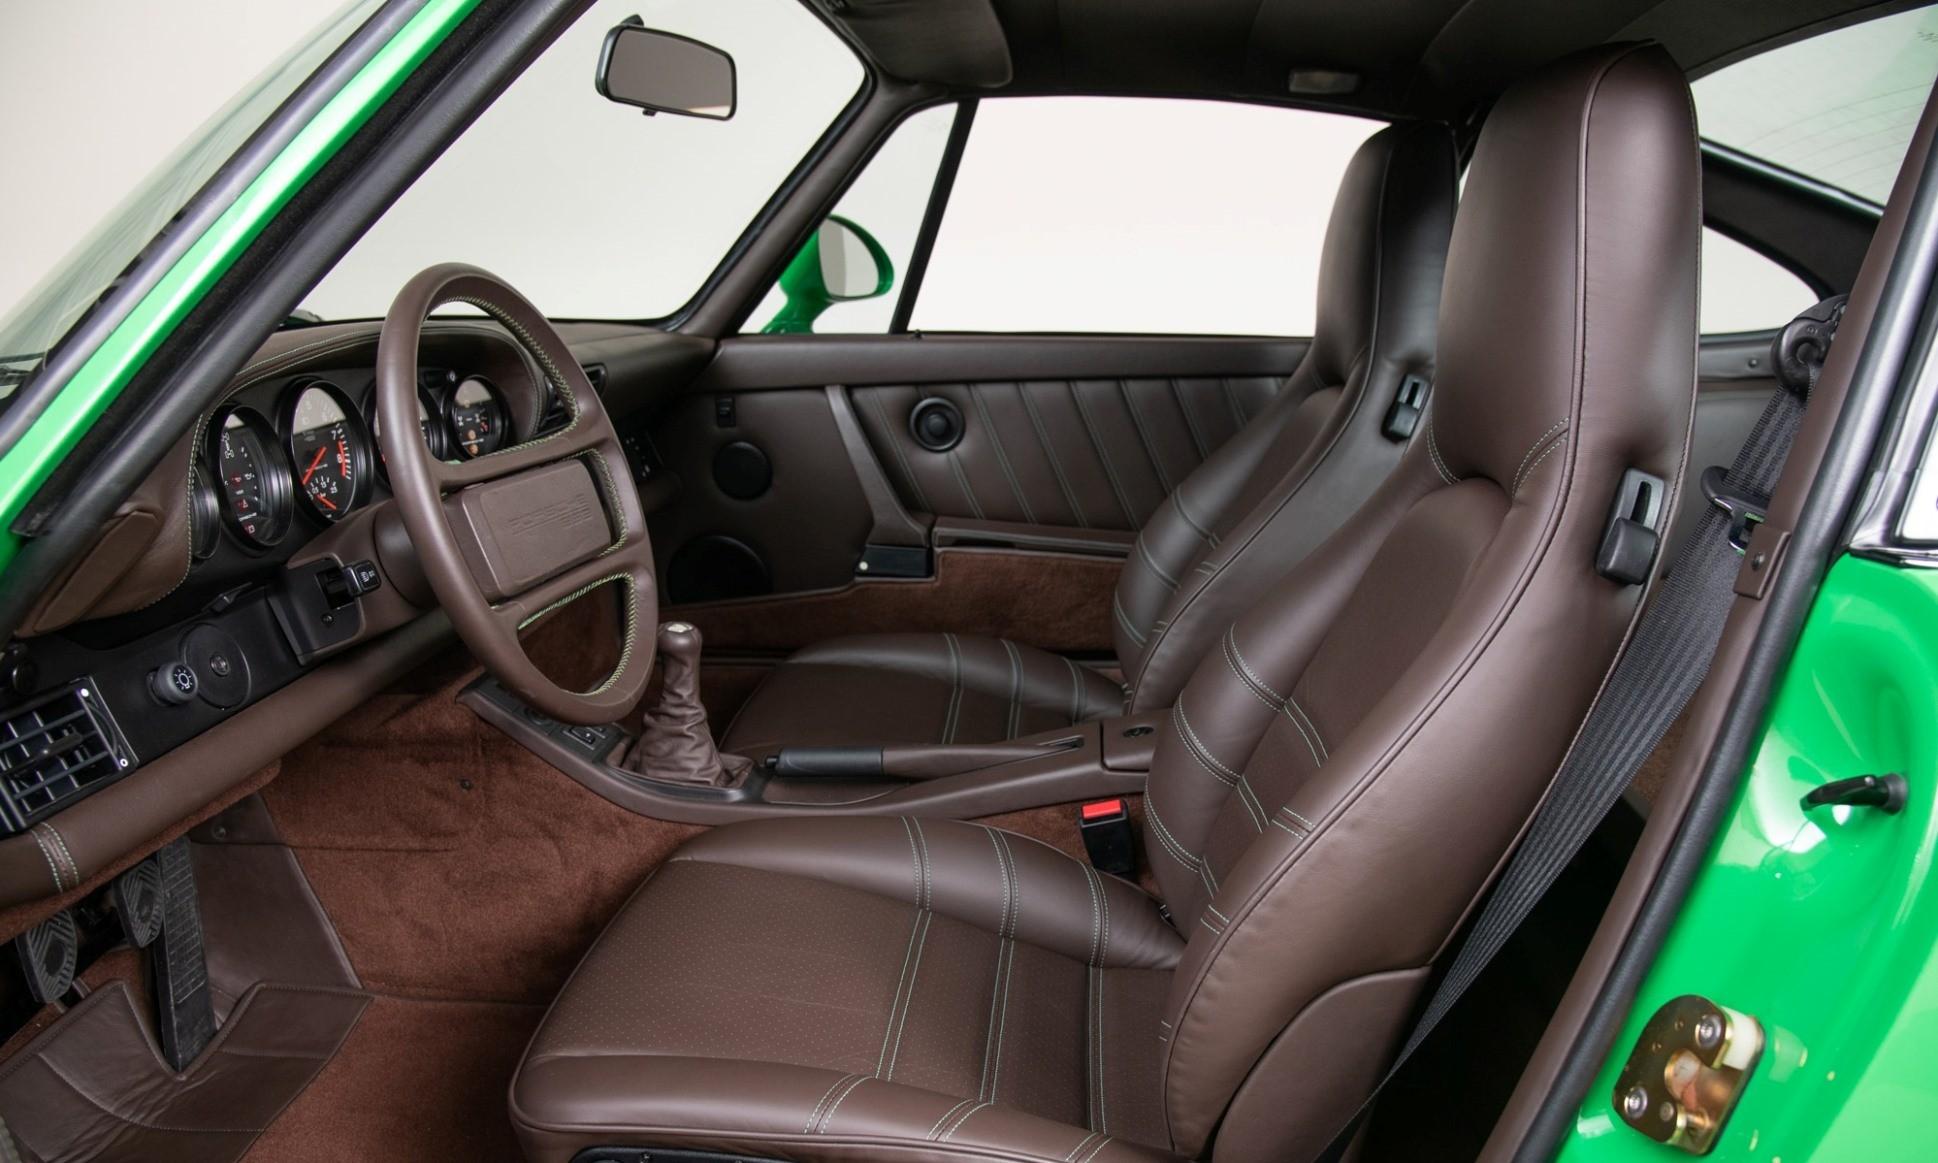 Porsche 959 Reimagined by Canepa interior